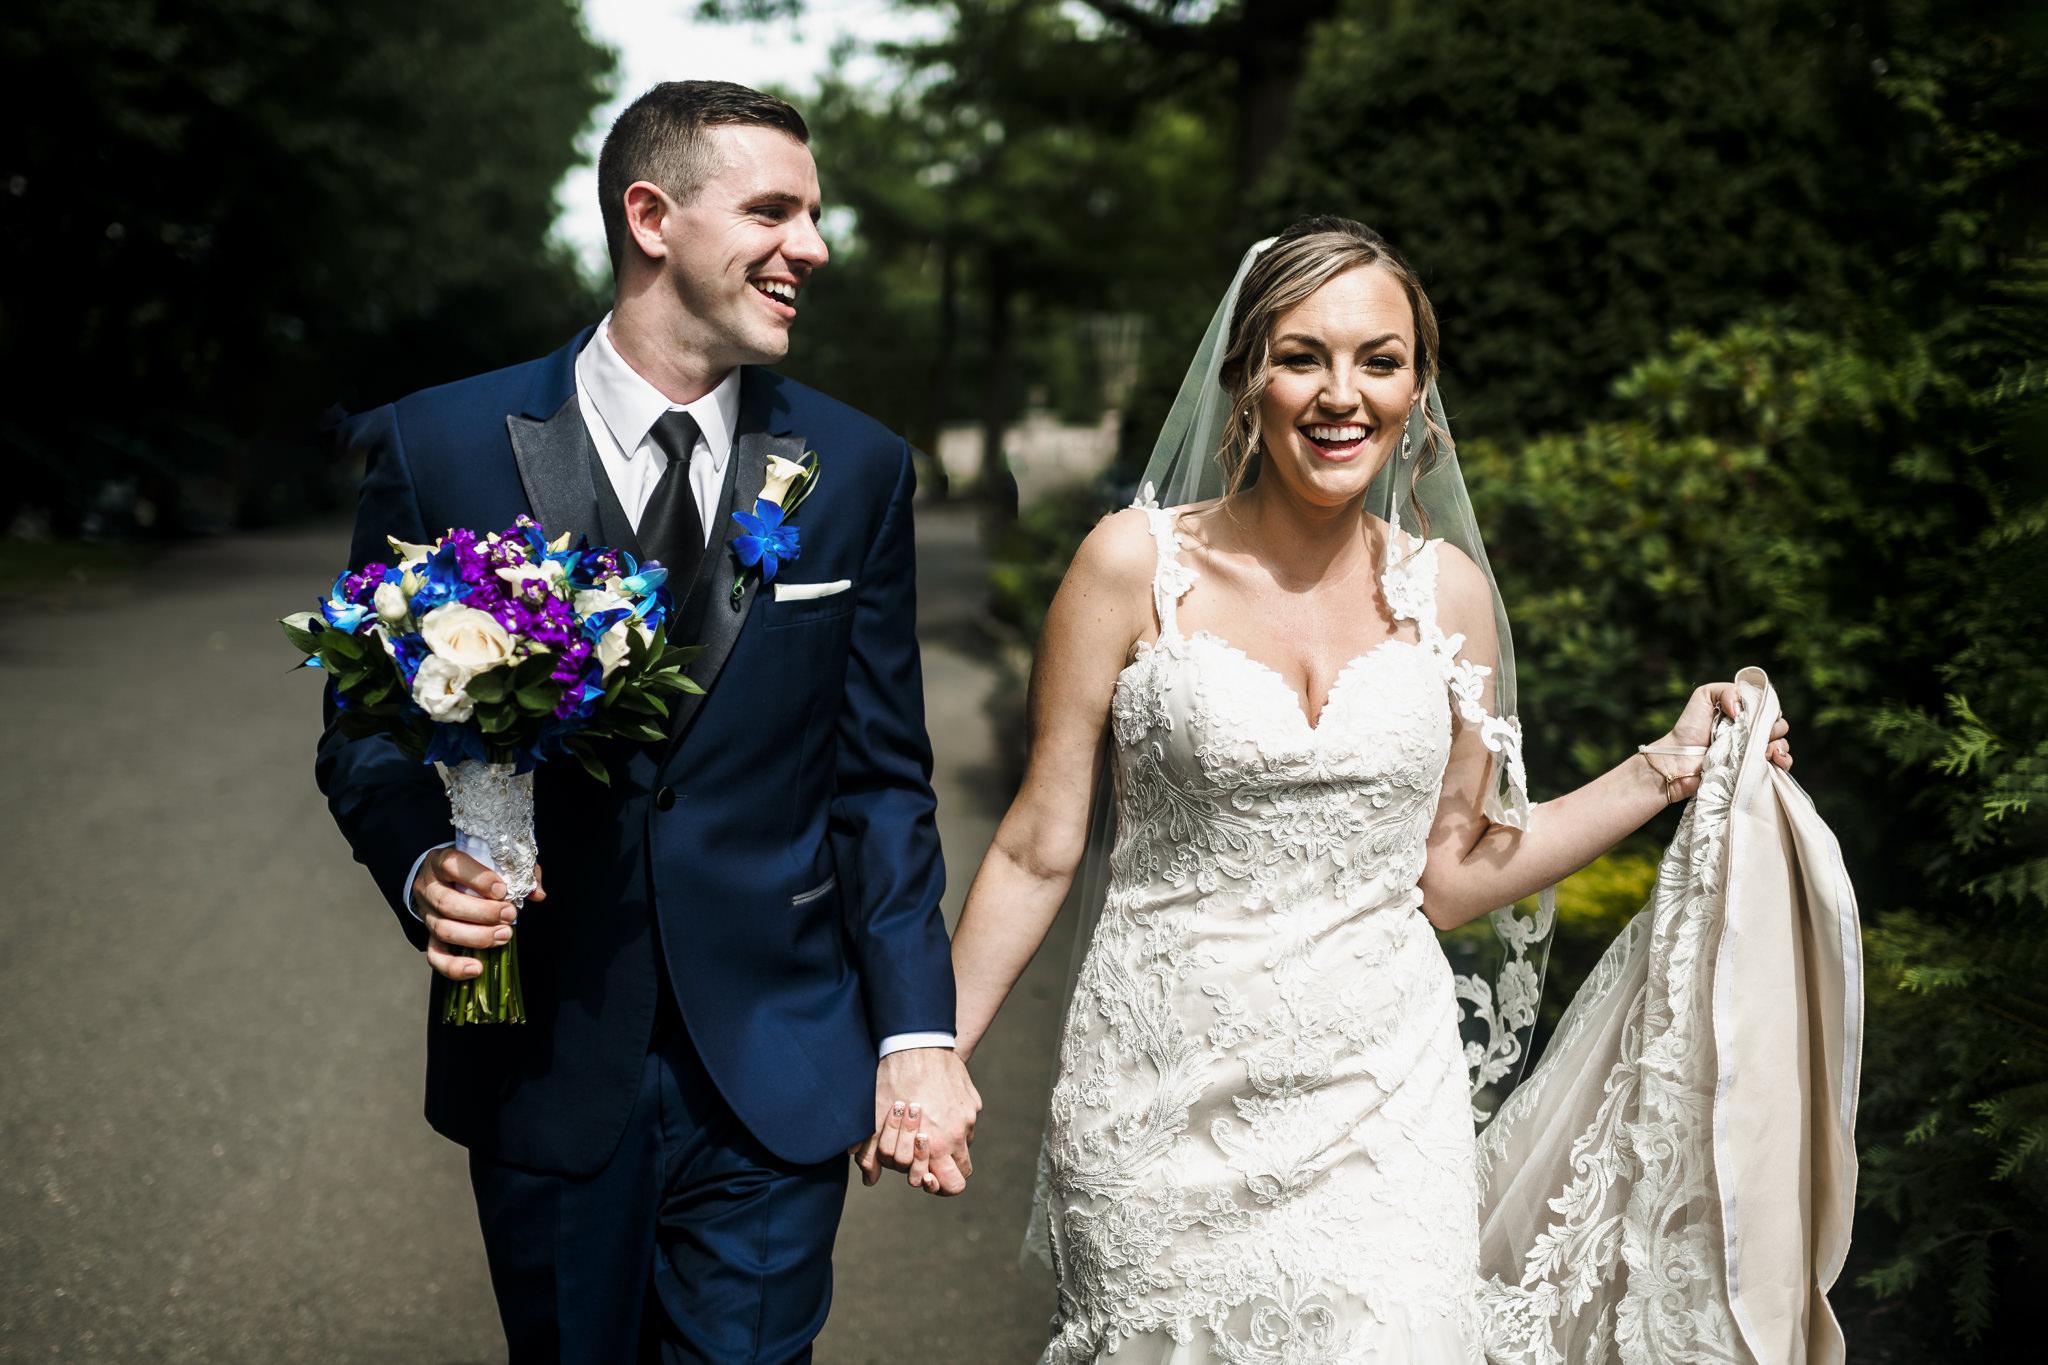 Brennan-South-Gate-Manor-New-Jersey-Wedding-Photographer-15.JPG